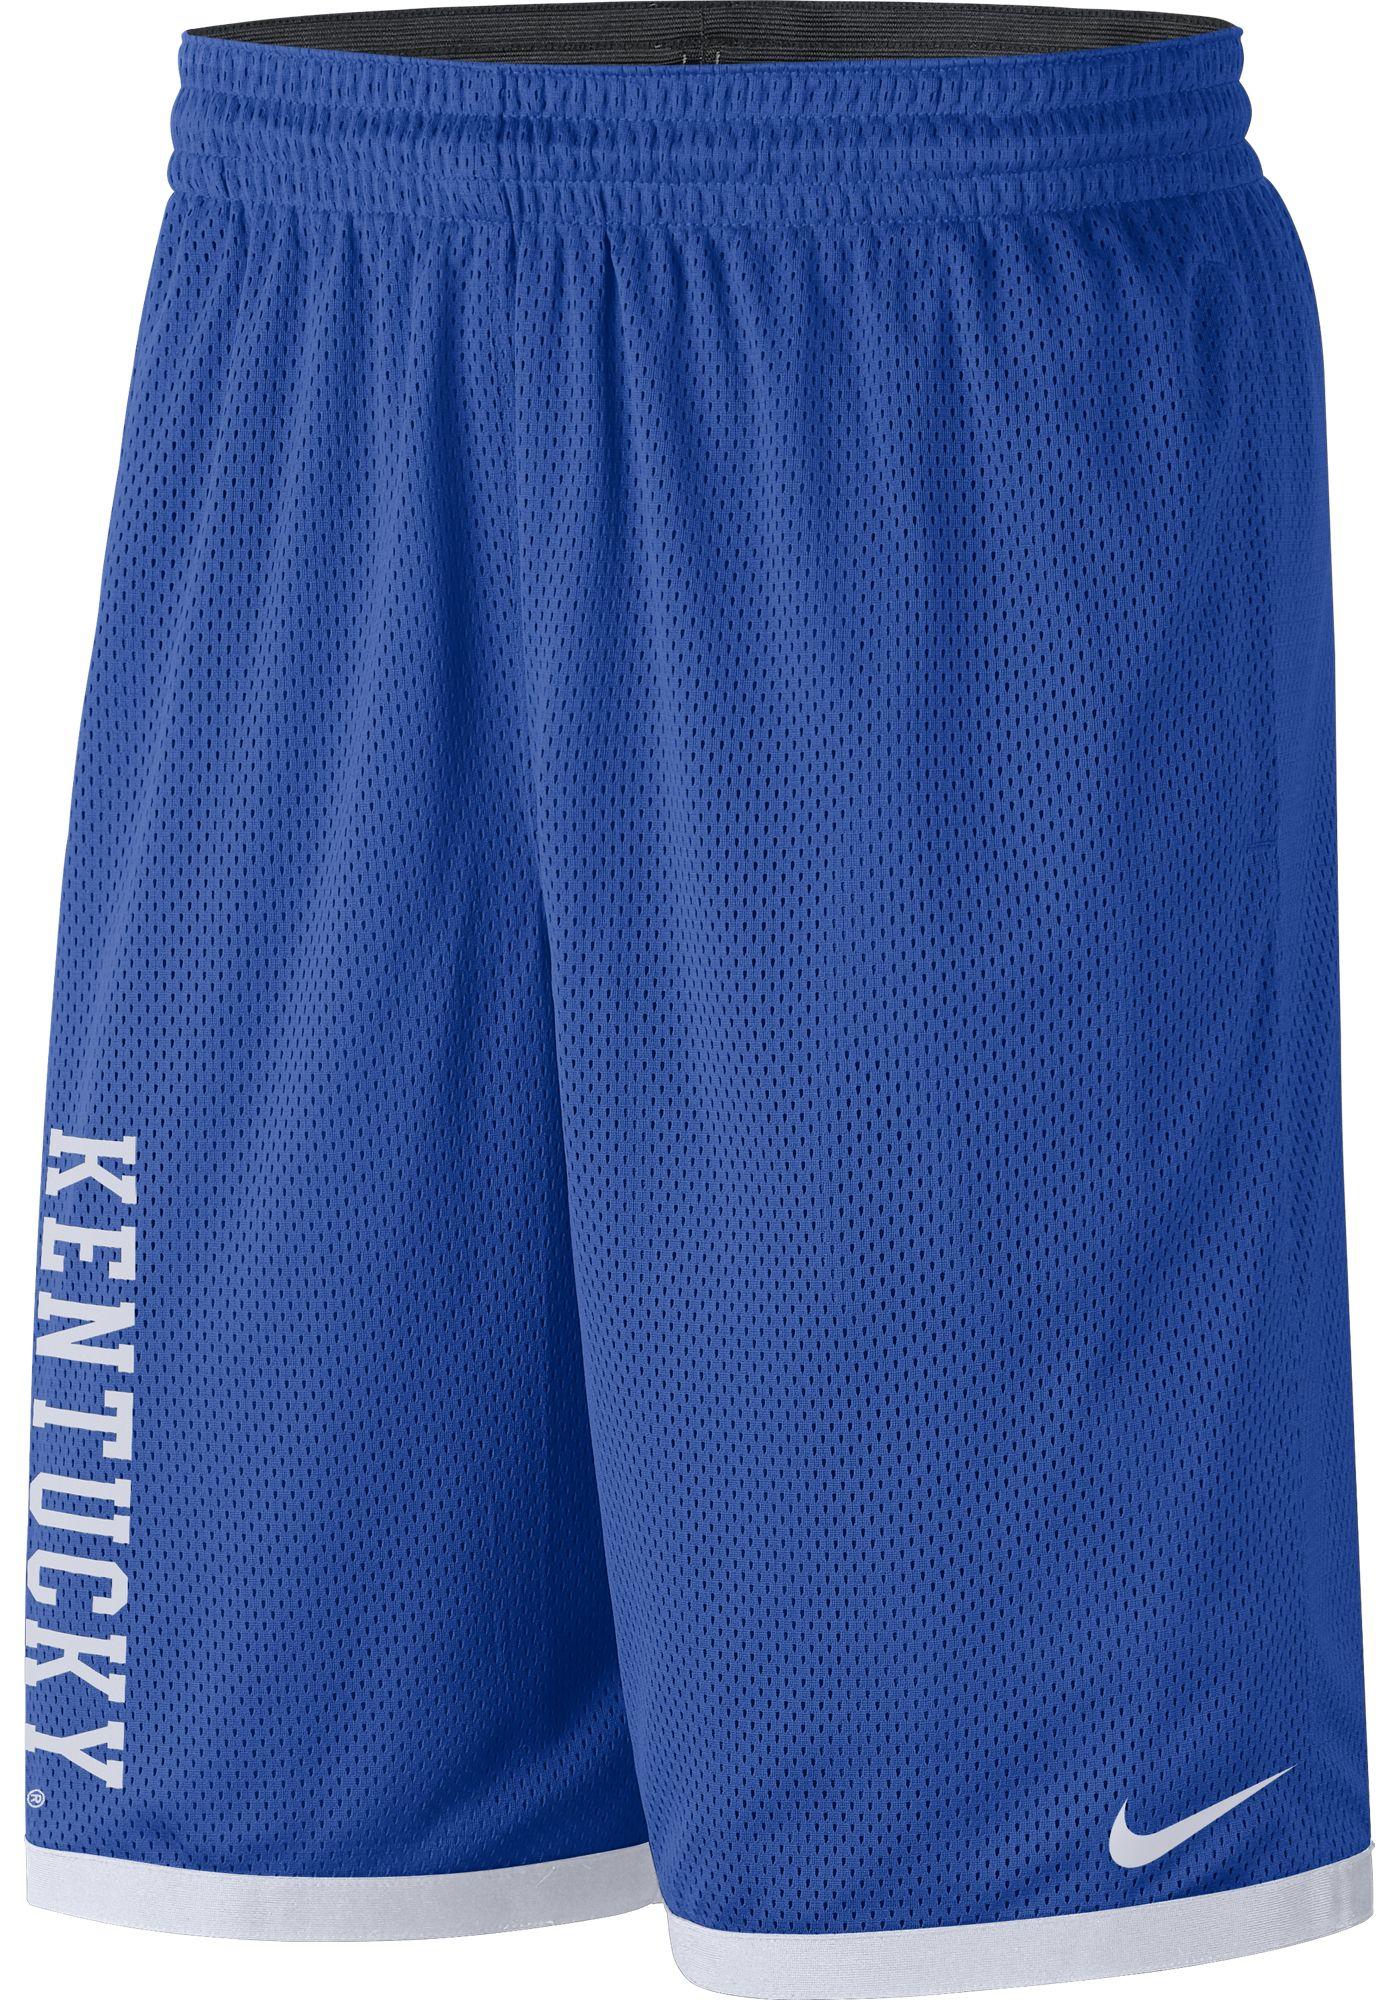 Nike Men's Kentucky Wildcats Blue Dri-FIT Mesh Basketball Shorts